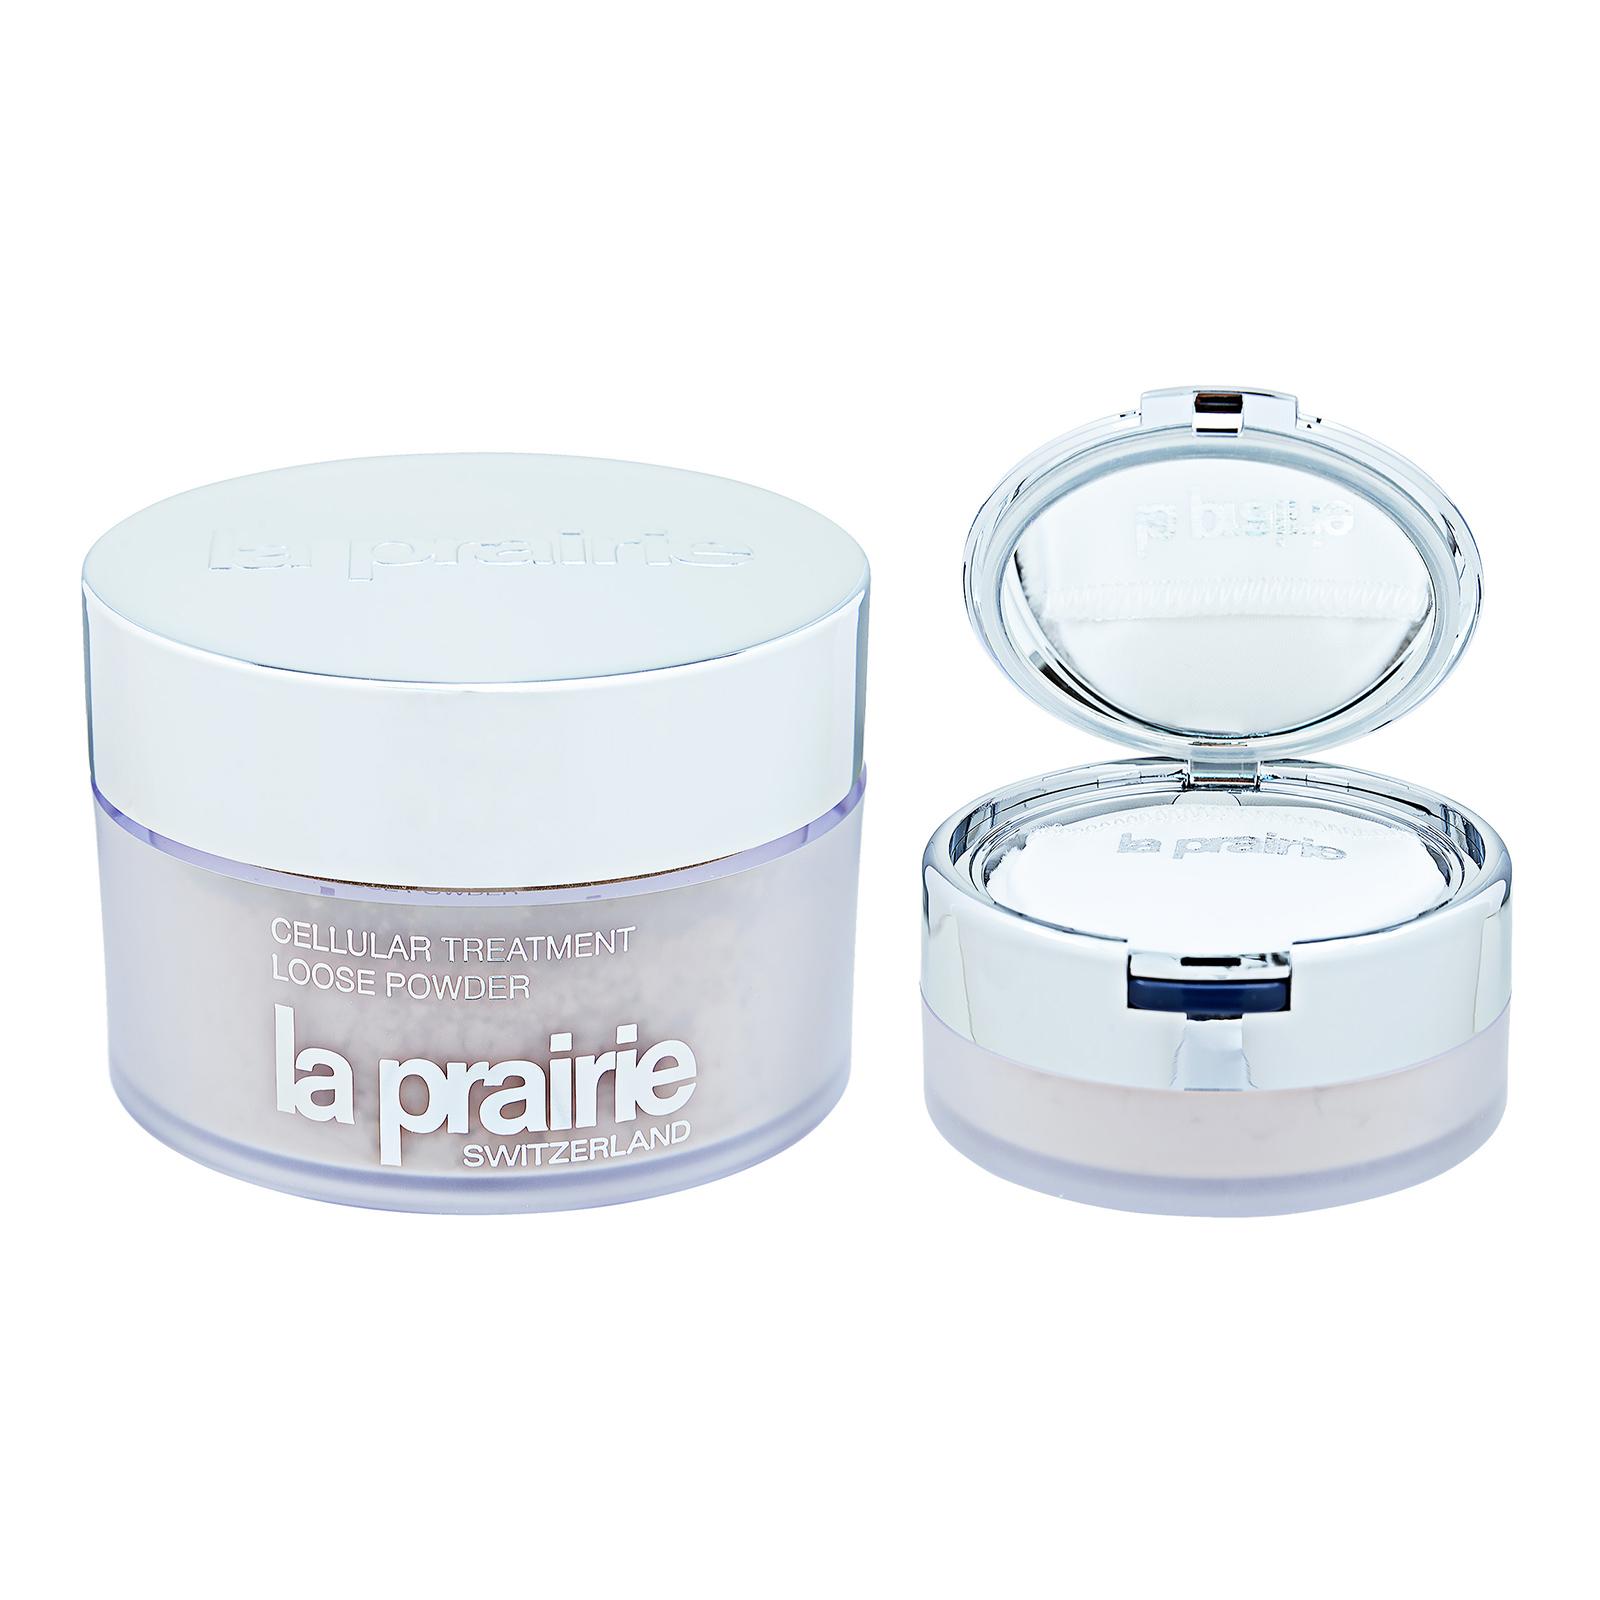 La Prairie Cellular  Treatment Loose Powder Translucent 2, 2+0.35oz, 56+10g from Cosme-De.com